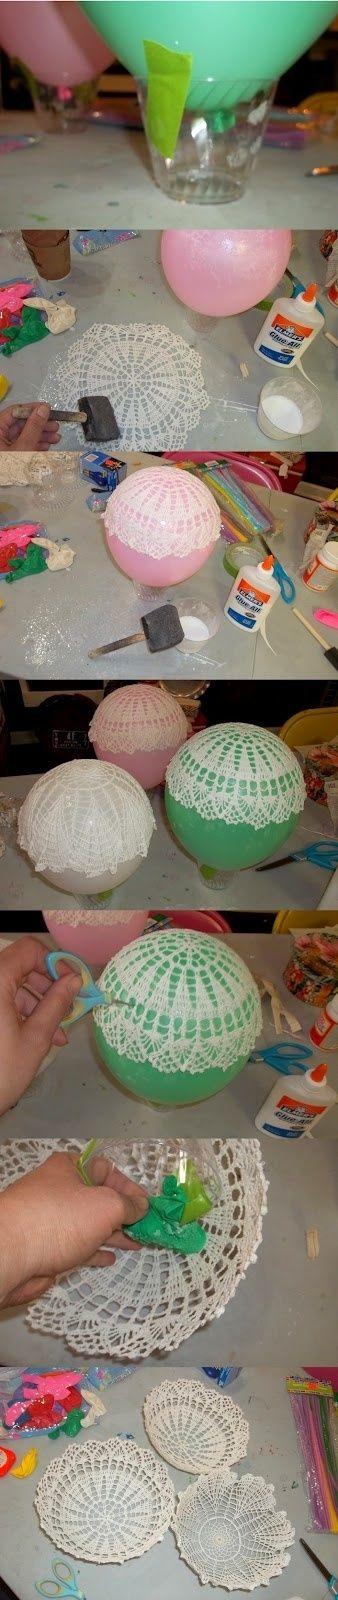 DIY :: Upcycled Doily Bowls | DIY | Pinterest | Bowls